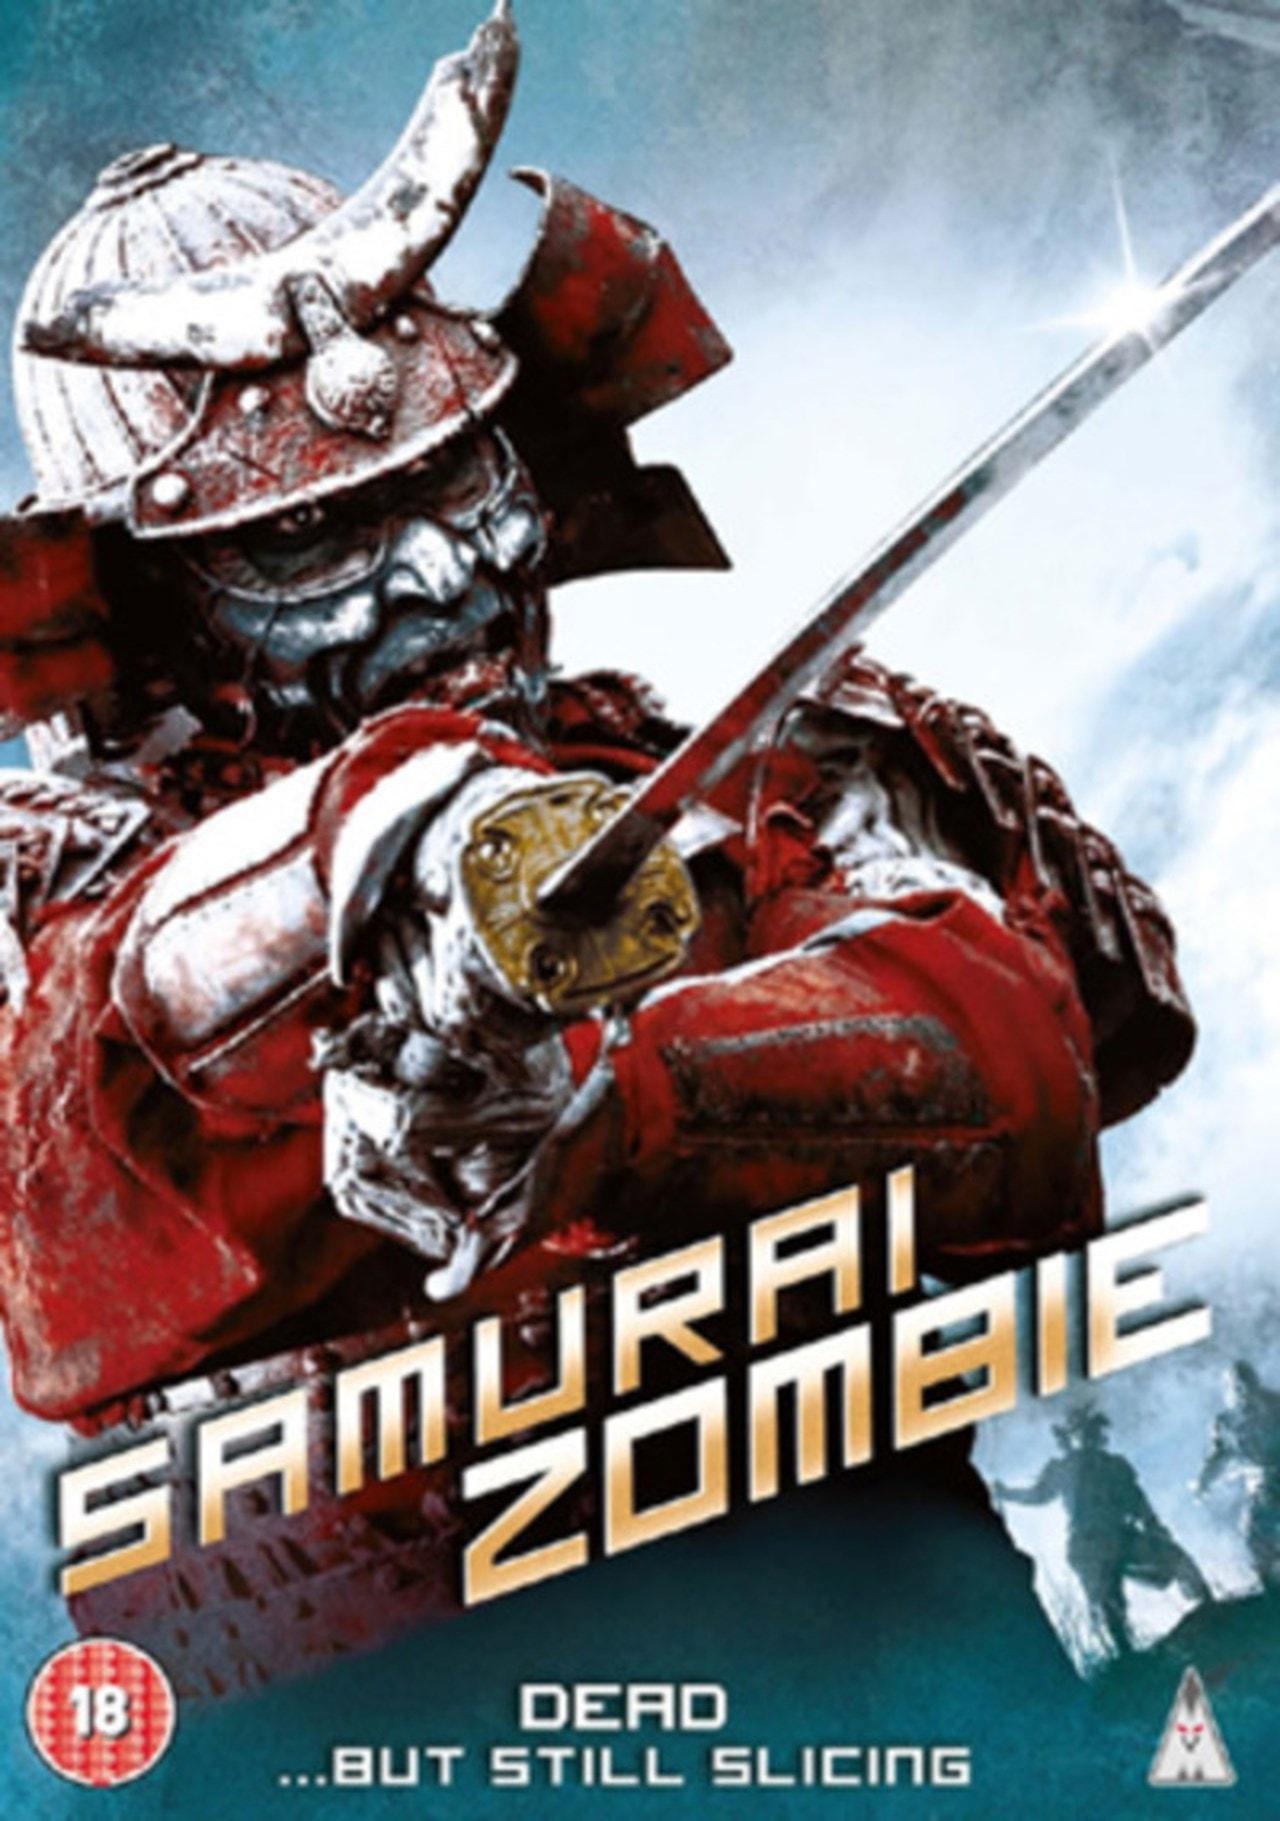 Samurai Zombie - 1